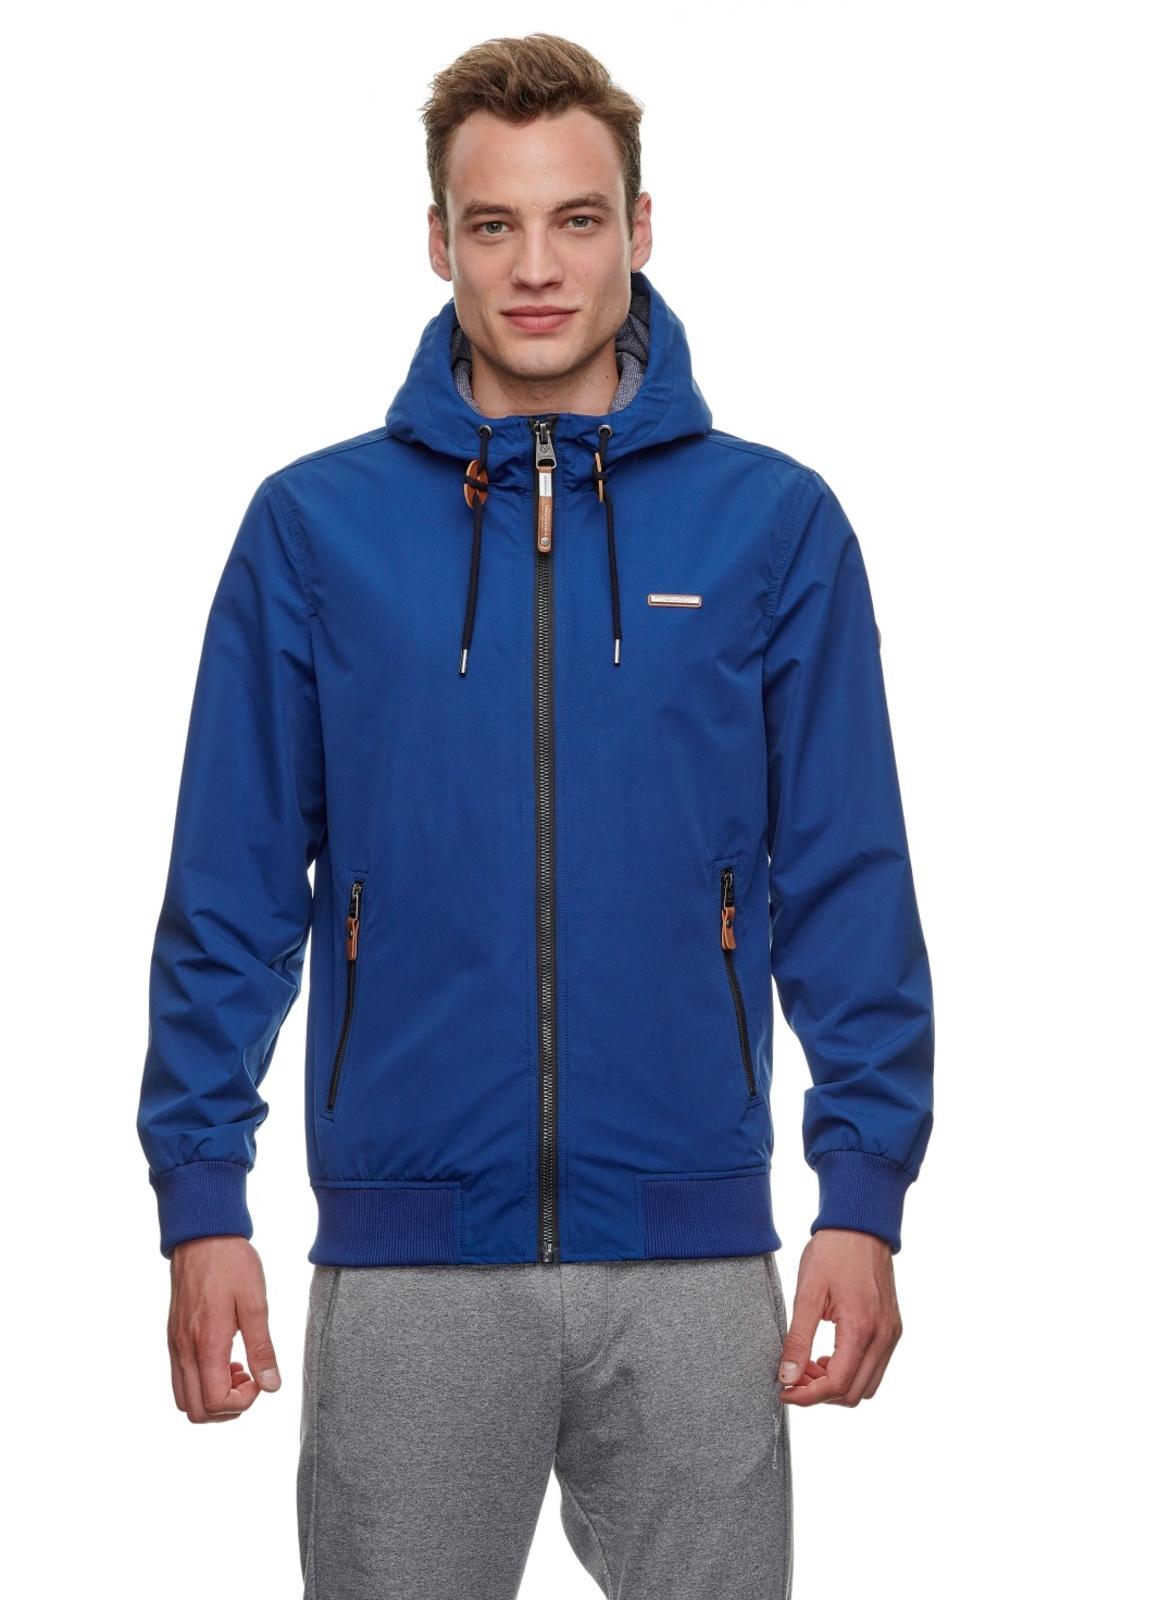 Ragwear Herren Vegane Sommer Jacke blau Percy 2112 60004 2050 indigo